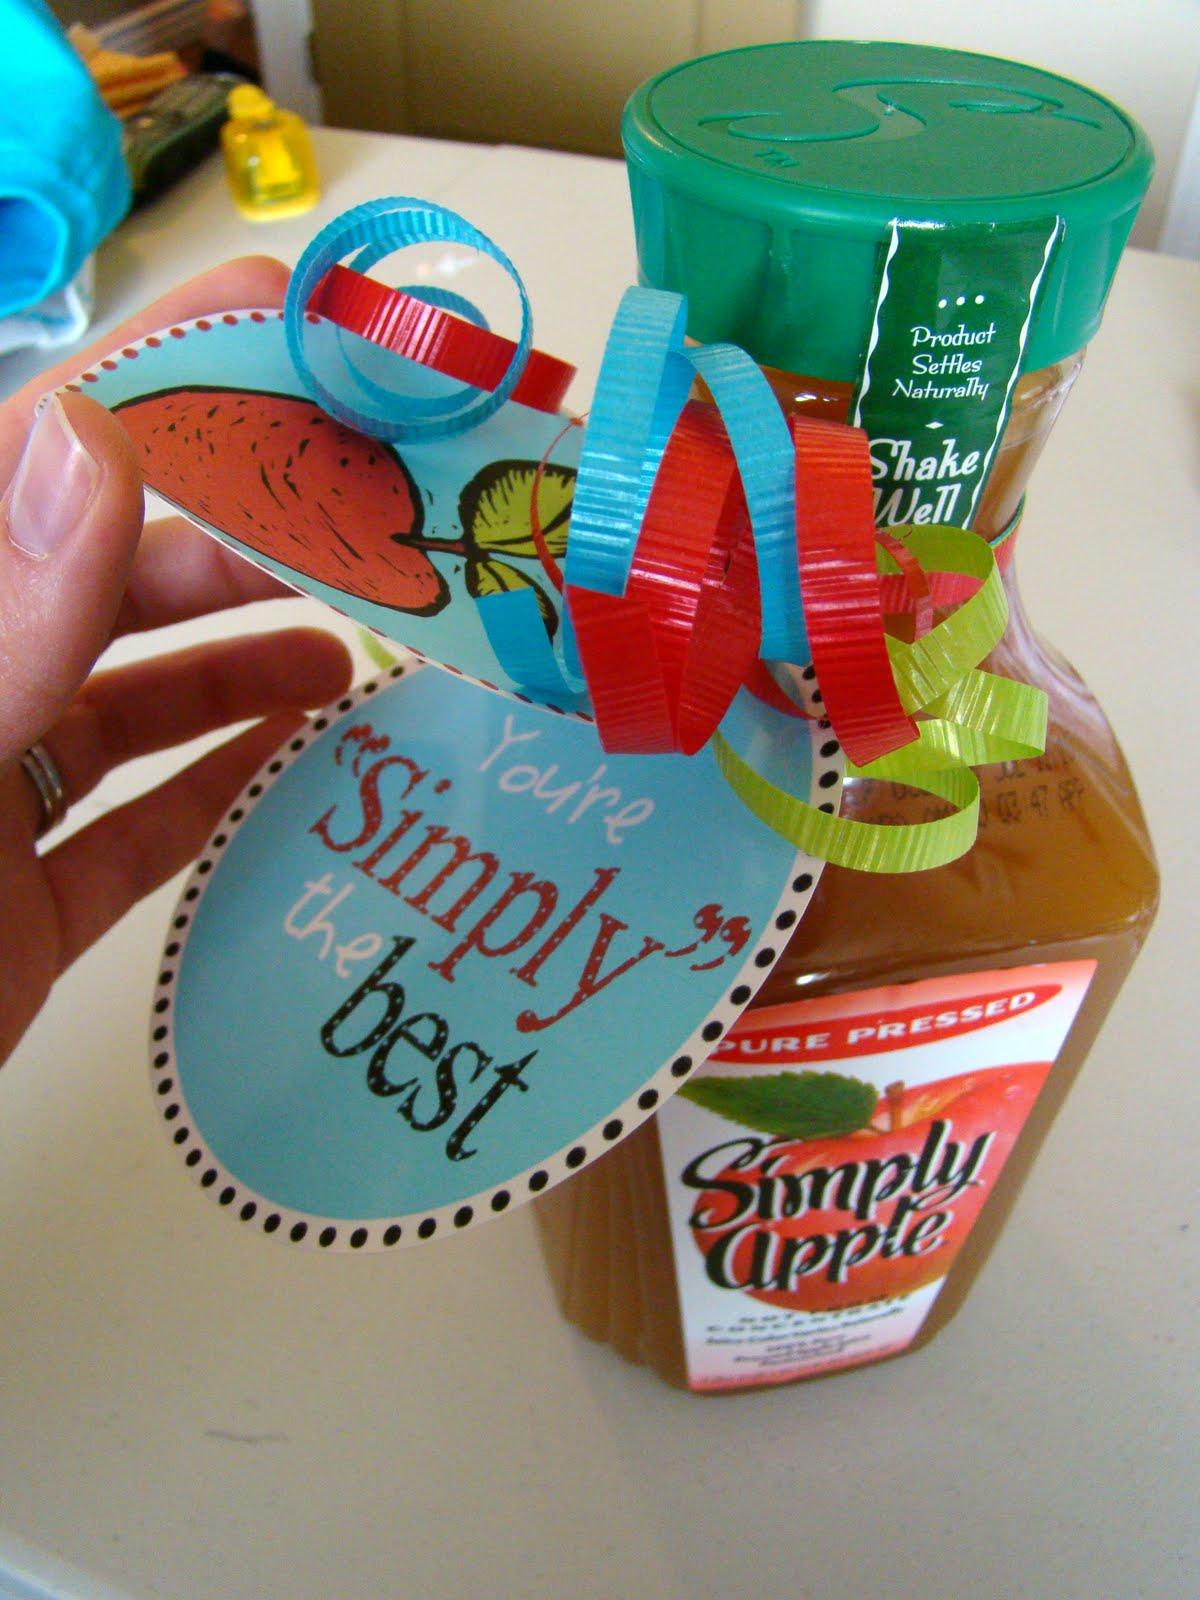 appreciation teacher gifts simply juice apple re employee week printables gift teachers employees idea diy basket printable give thank valentine